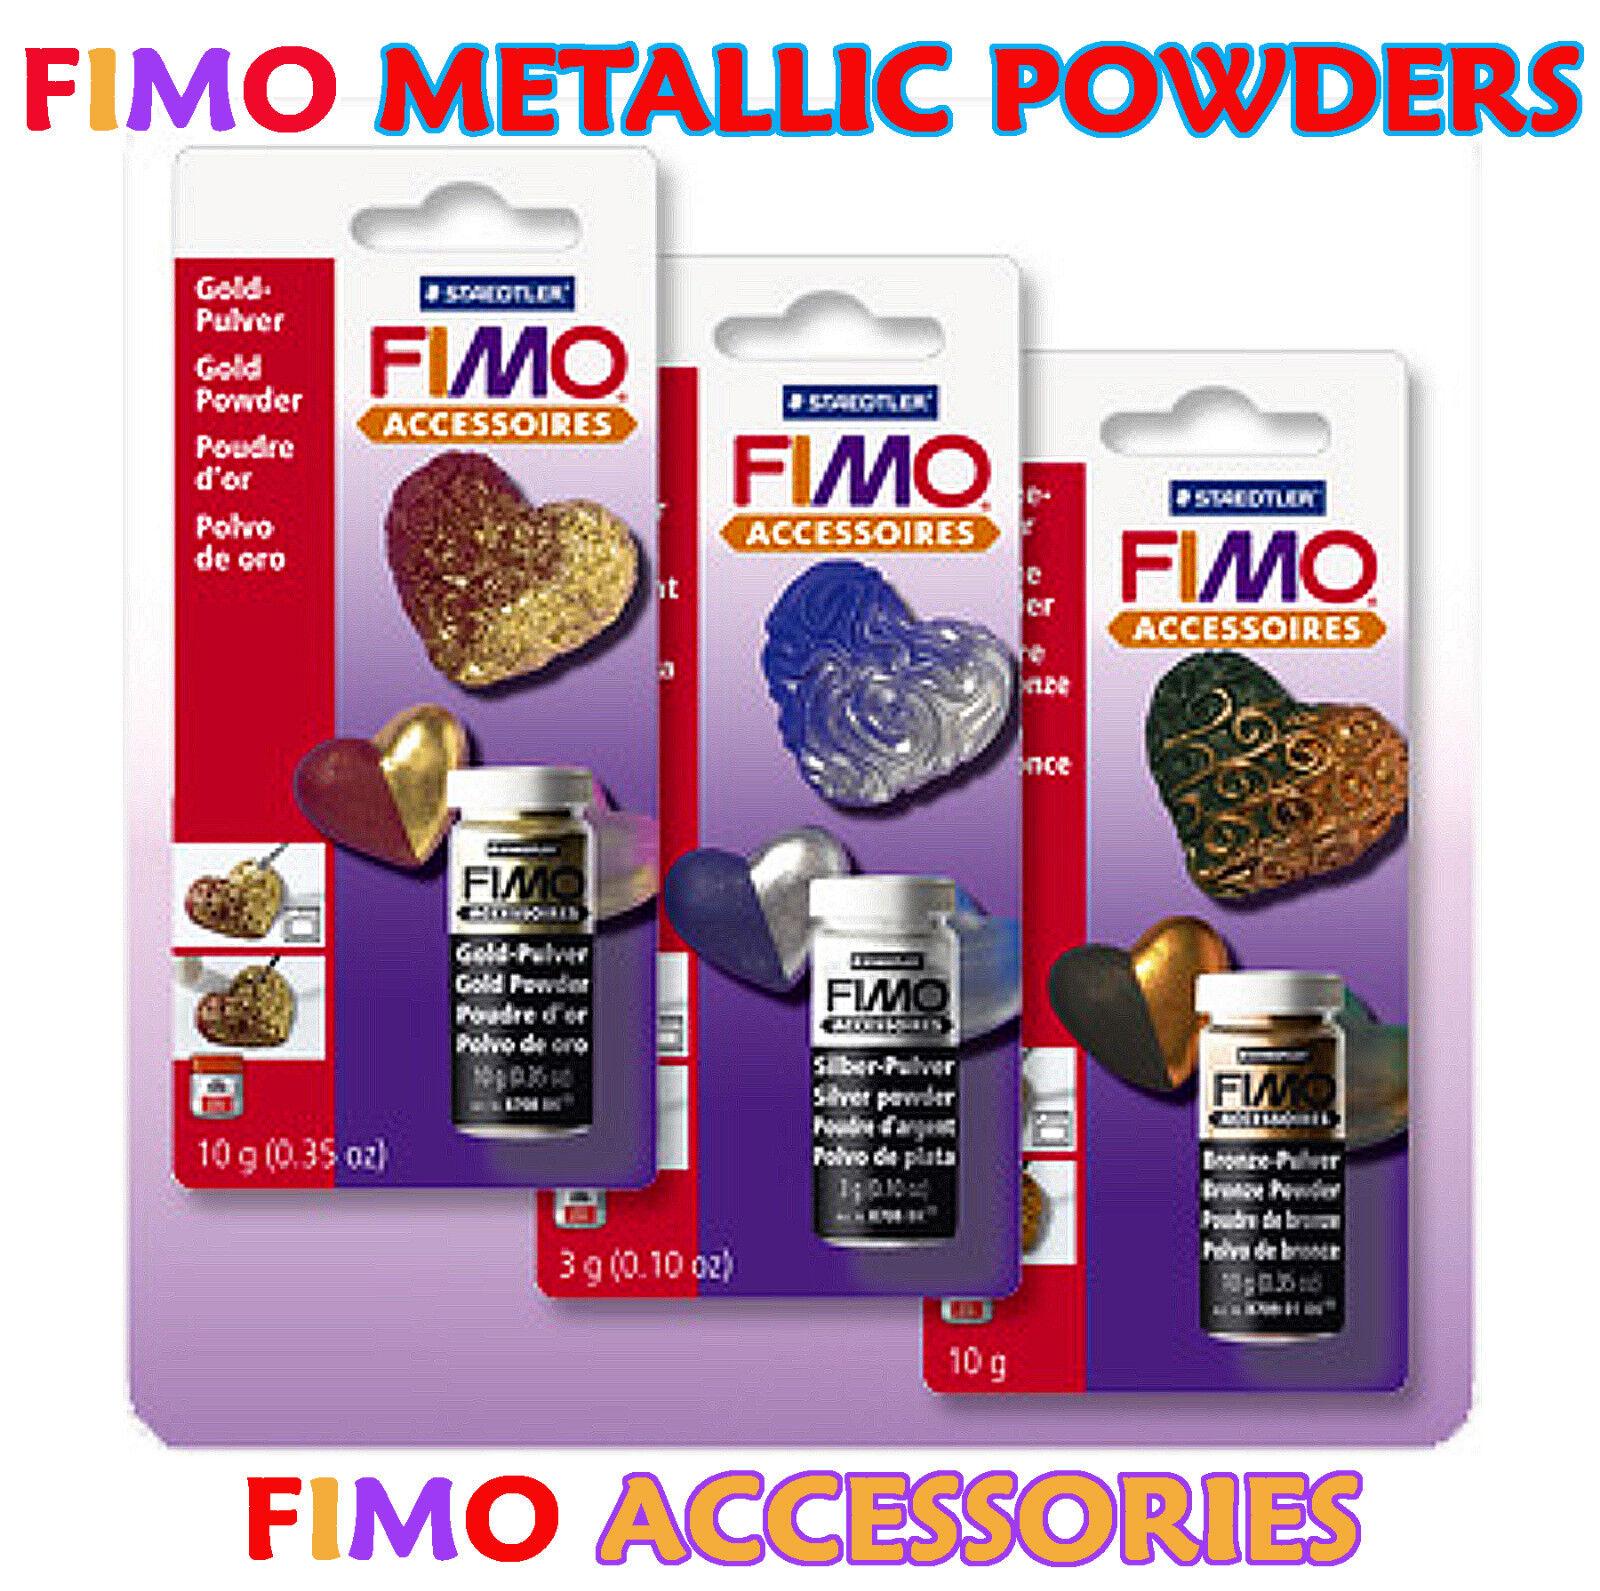 Creative Ideas Leicester: FIMO ACCESSORIES METALLIC GOLD / SILVER / BRONZE POWDERS